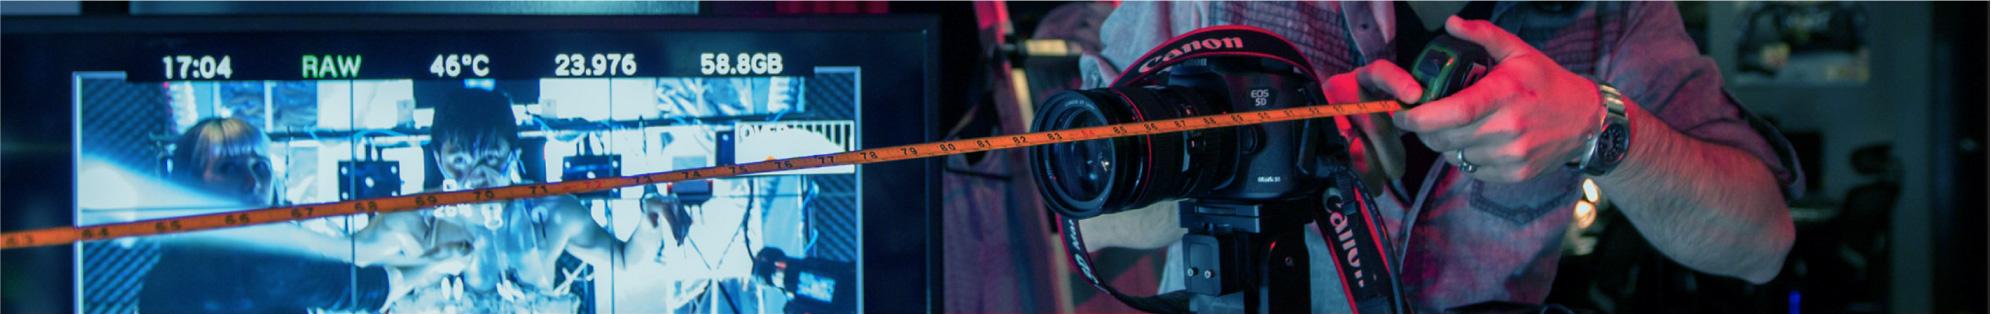 Vancouver's Economic Snapshot and key Economic Metrics - North America's 3rd Largest Digital Entertainment Sector